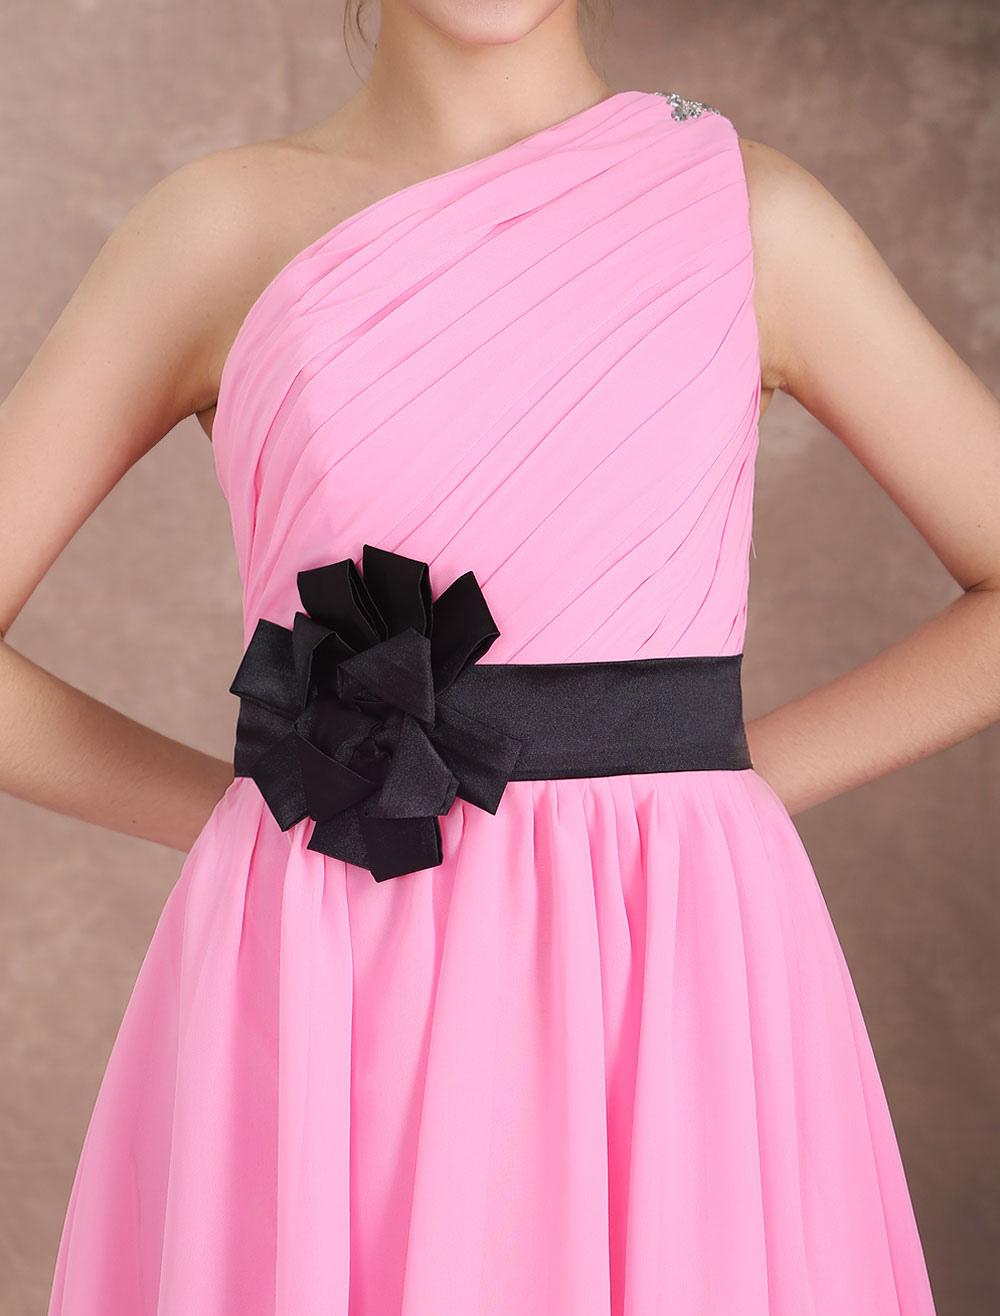 Milanoo / One-Shoulder Bow Bridesmaid Dress Sash Chiffon Dress